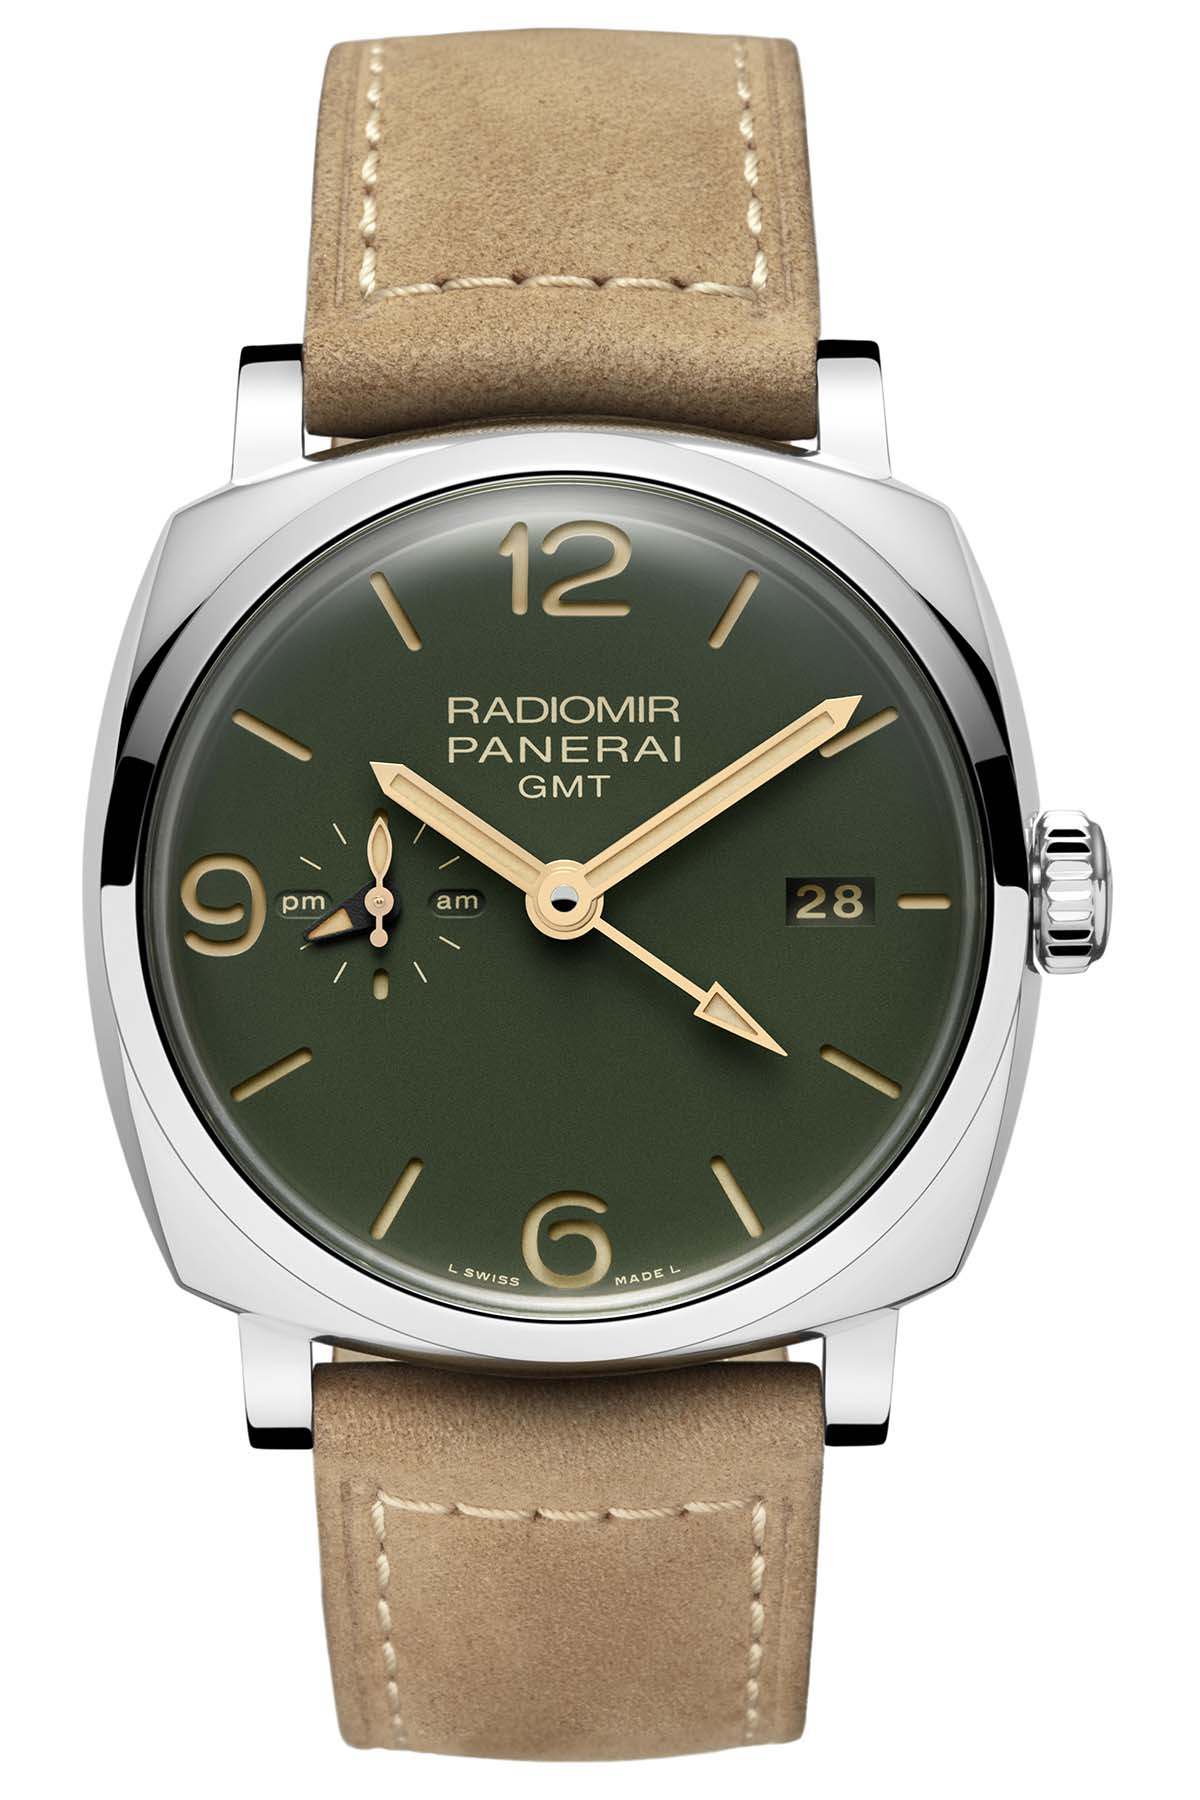 Panerai Radiomir 1940 GMT 45mm military green PAM00998